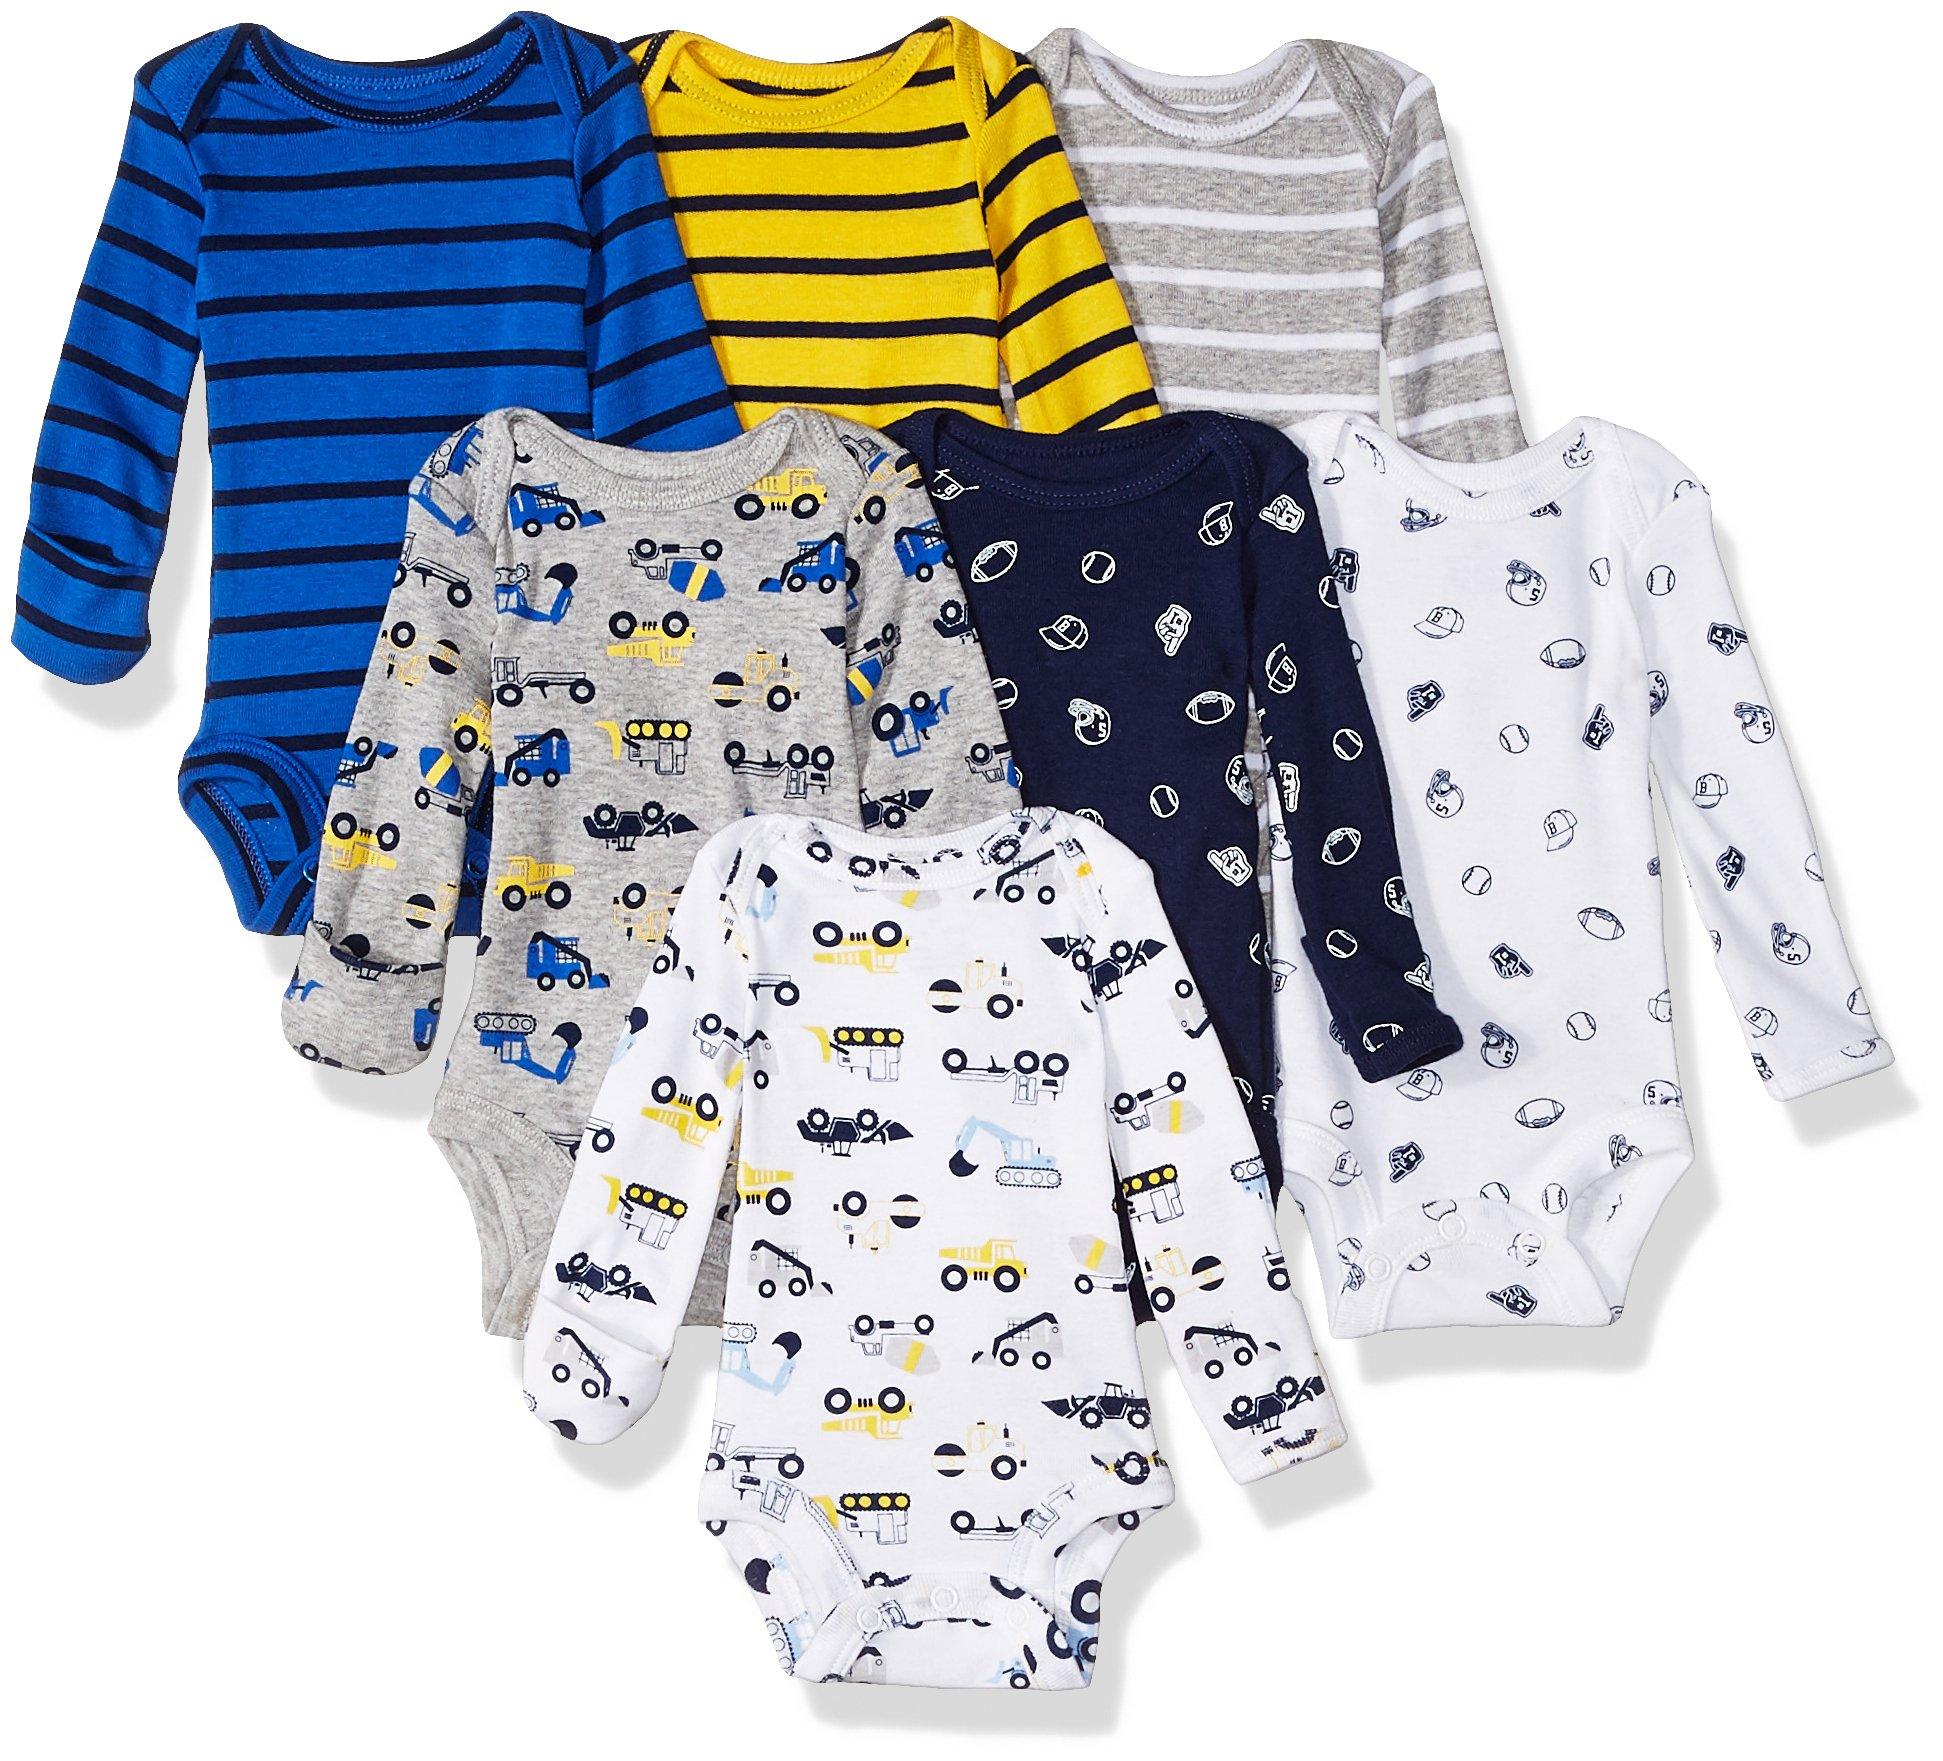 Carter's Baby Boys' 7-Pack Long-Sleeve Bodysuits